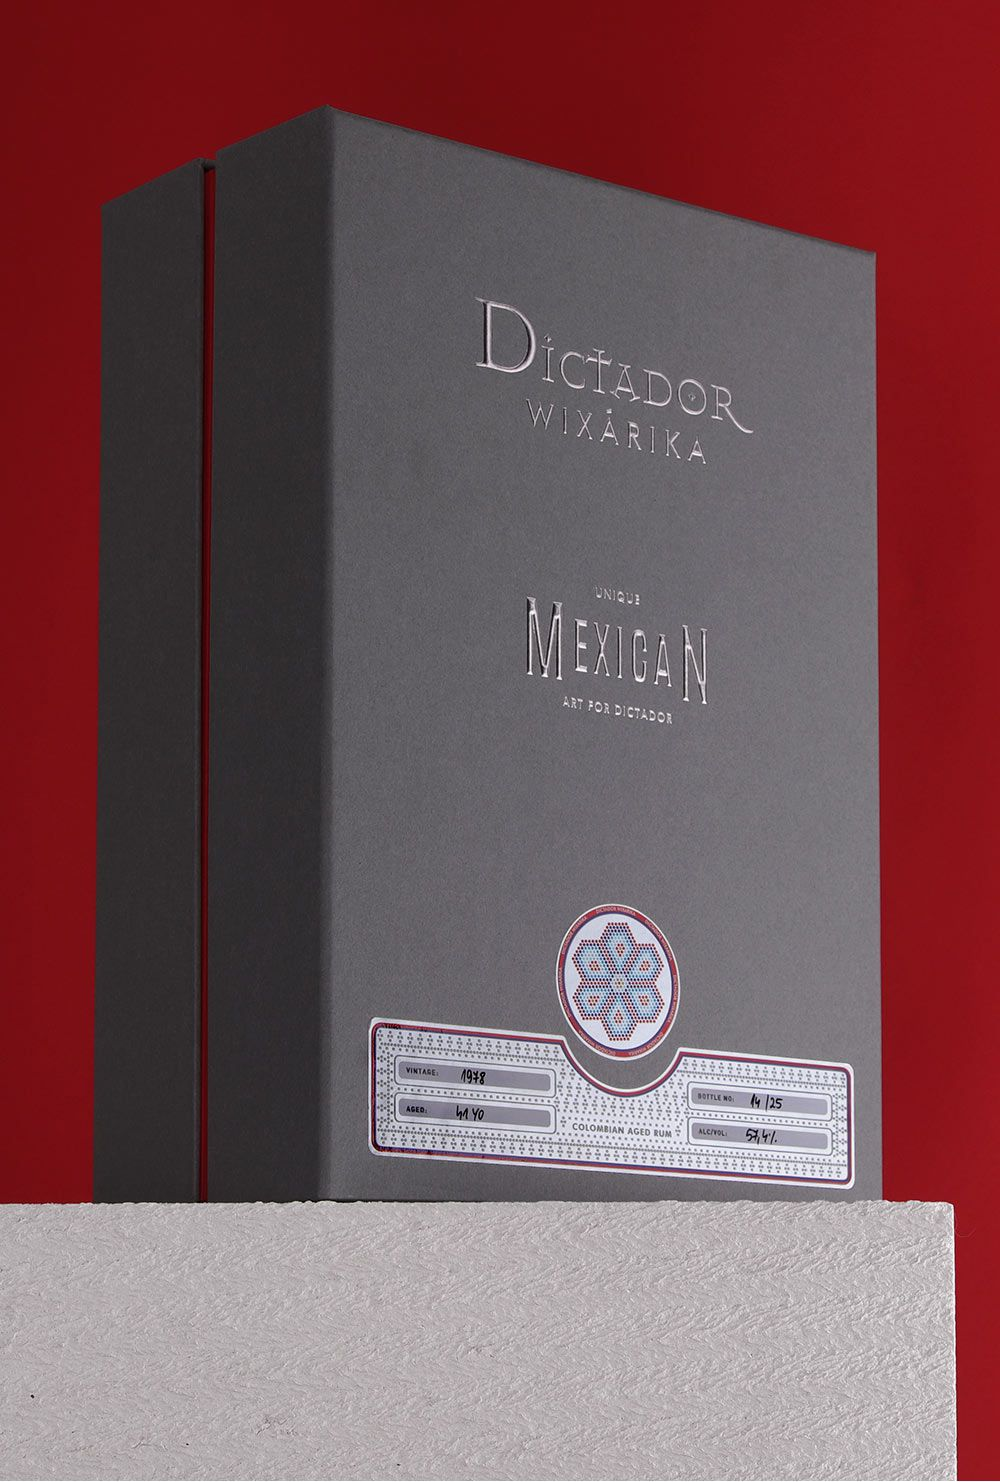 Dictador Wixarika - Model 2018/8